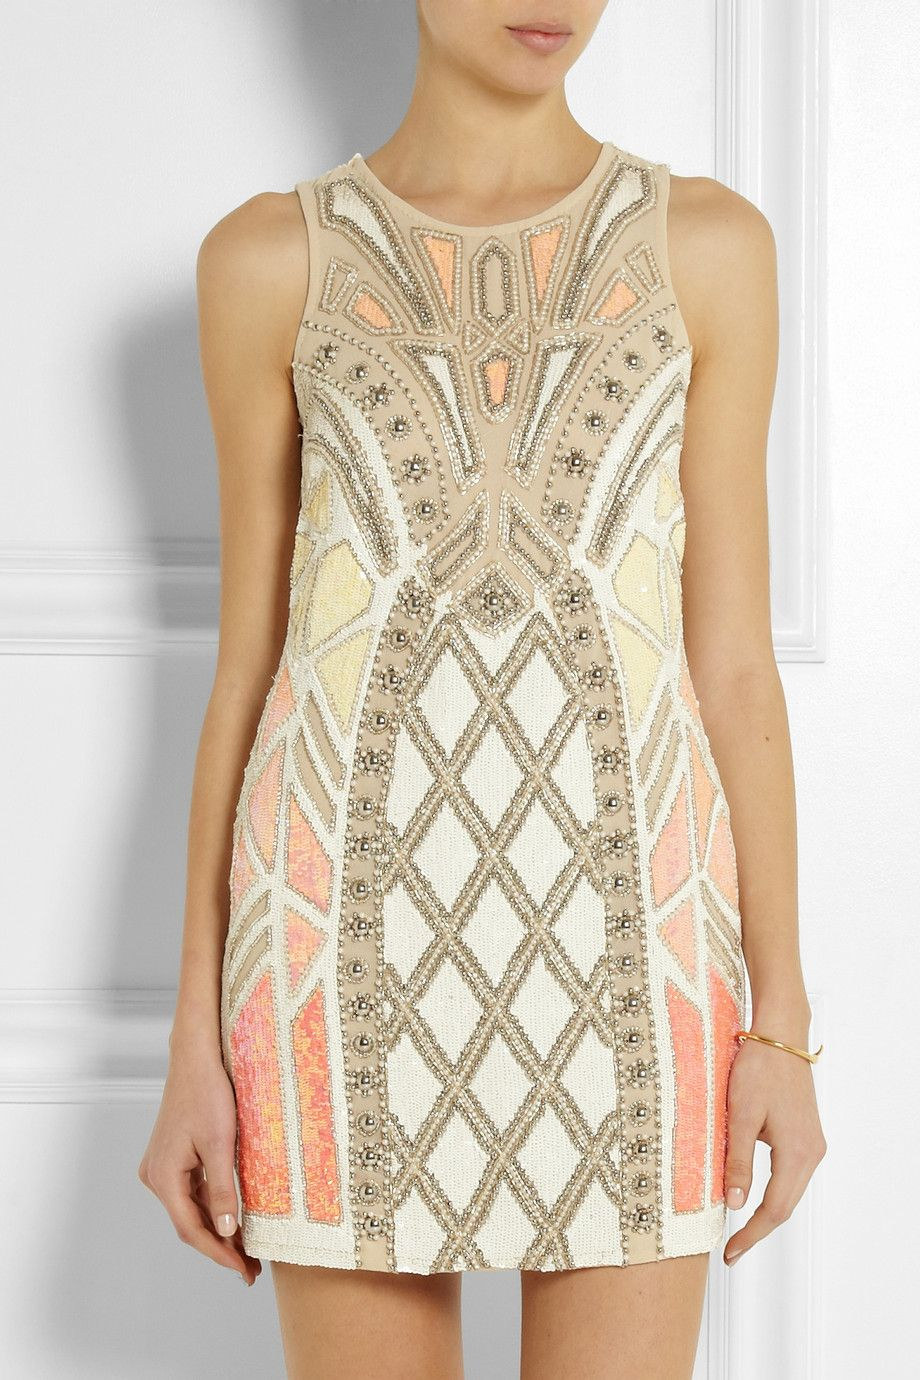 Needle Thread | Geo Sundown embellished chiffon mini dress | NET-A-PORTER.COMhttp://www.net-a-porter.com/product/435275/Needle_and_Thread/geo-sundown-embellished-chiffon-mini-dress